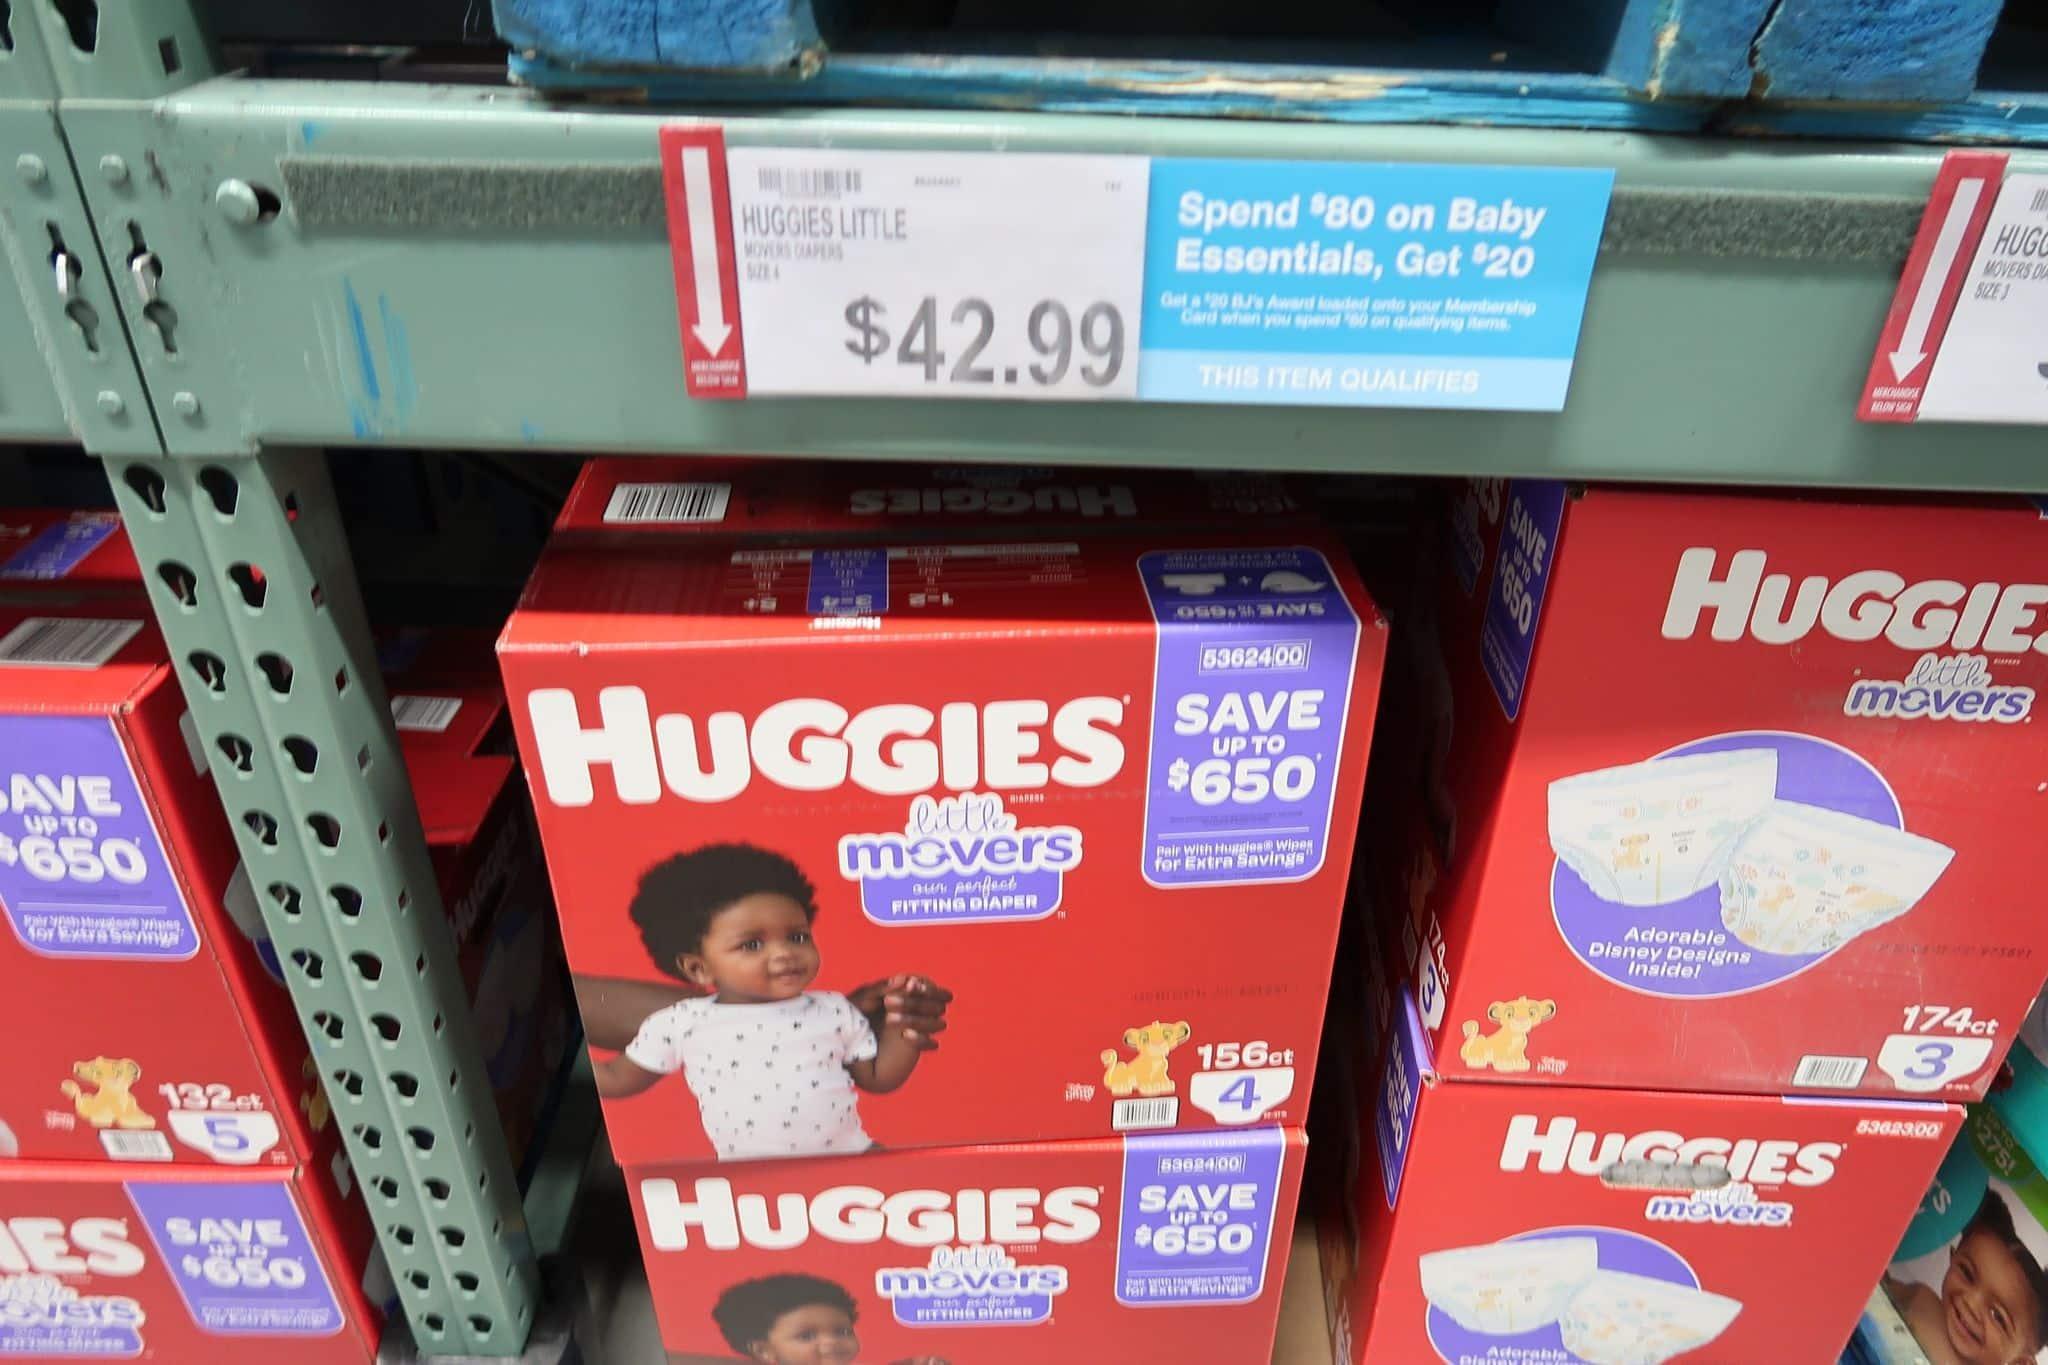 Save $8 on Huggies Diapers at BJs!